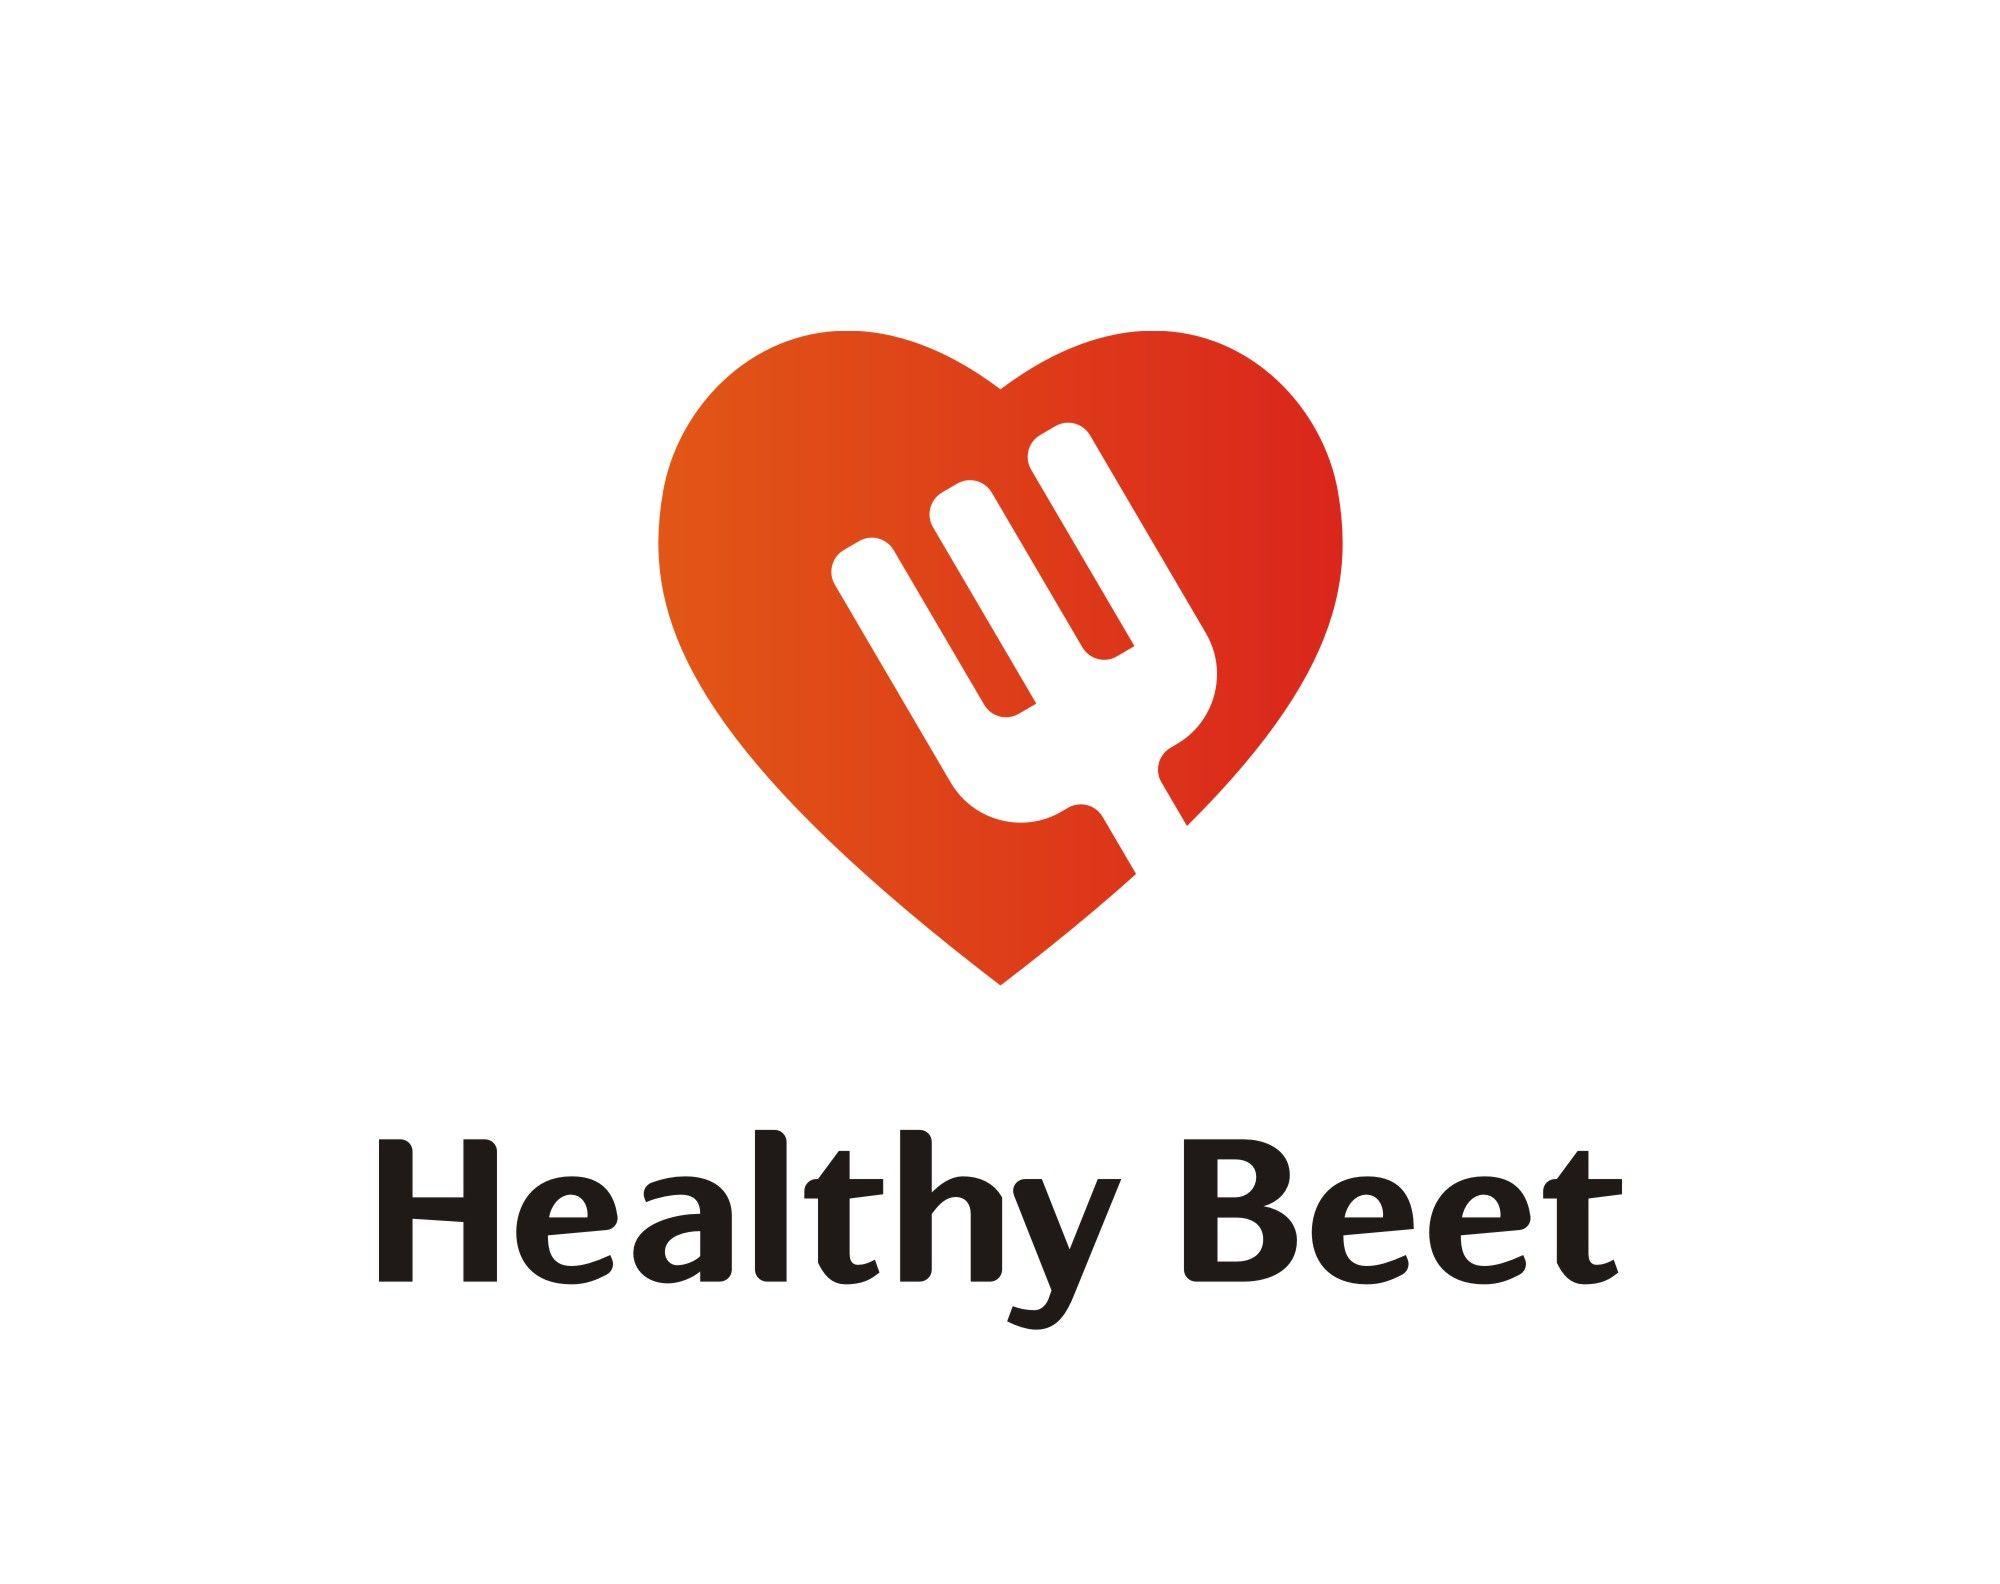 Healthy Bit или Healthy Beet - дизайнер flea